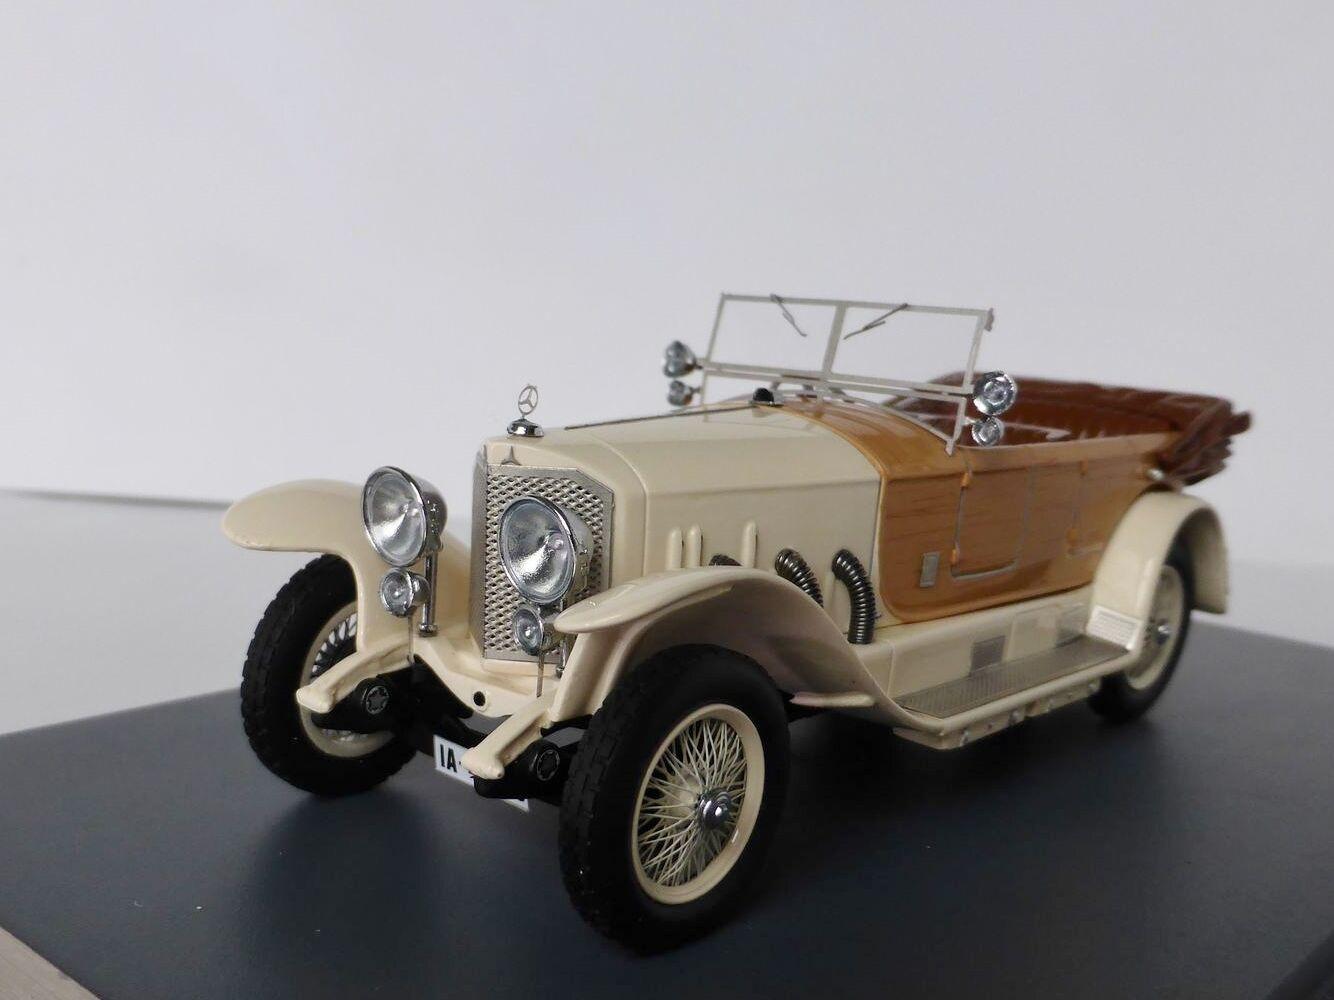 Mercedes-Benz 28-95 Ps 1922 1/43 Neoscalemodels Neo